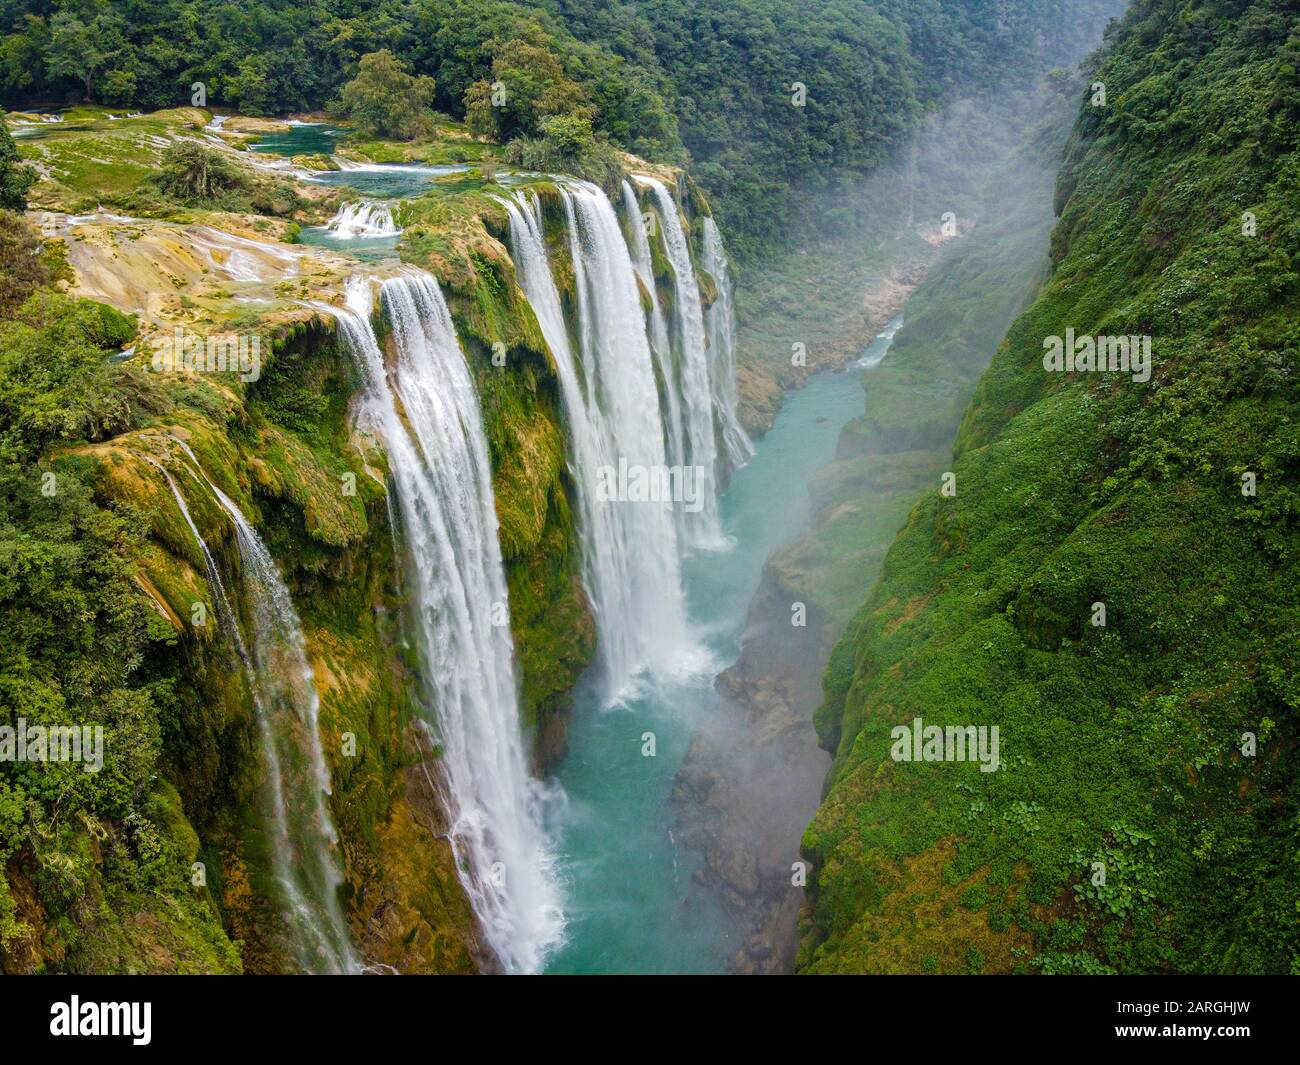 Tamul Fotos E Imagenes De Stock Alamy